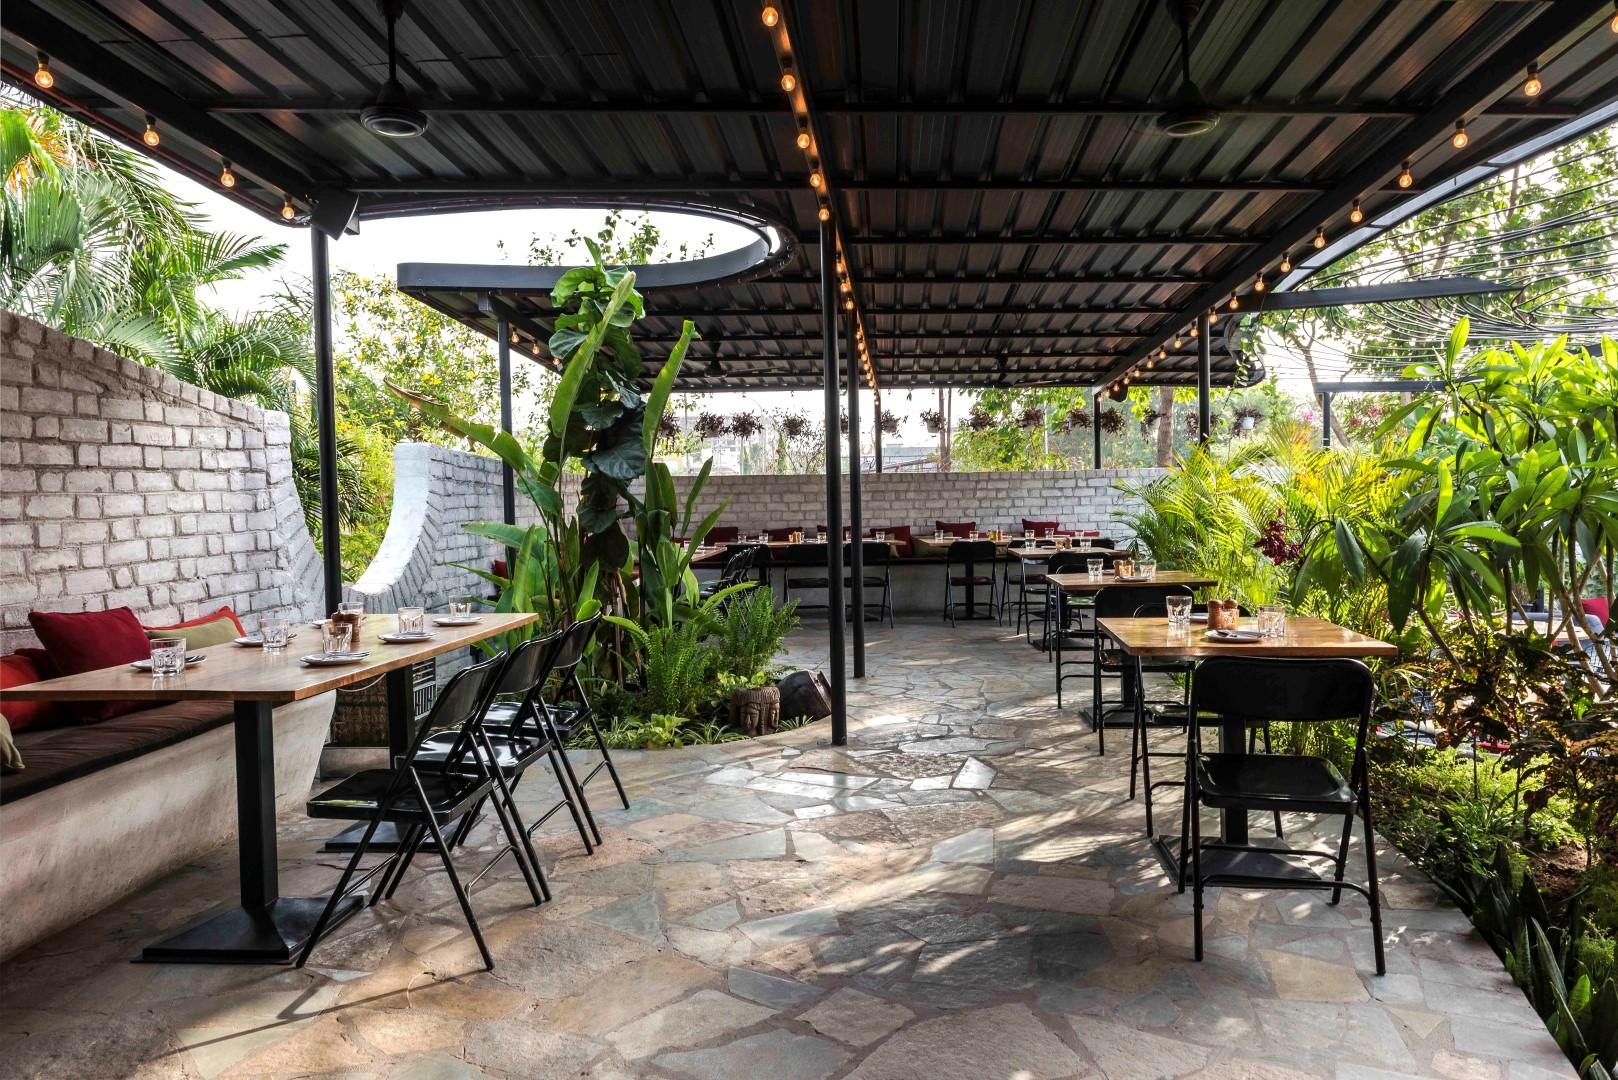 THINK OF IT! - Garden Restaurant   Studio Lagom - The ...